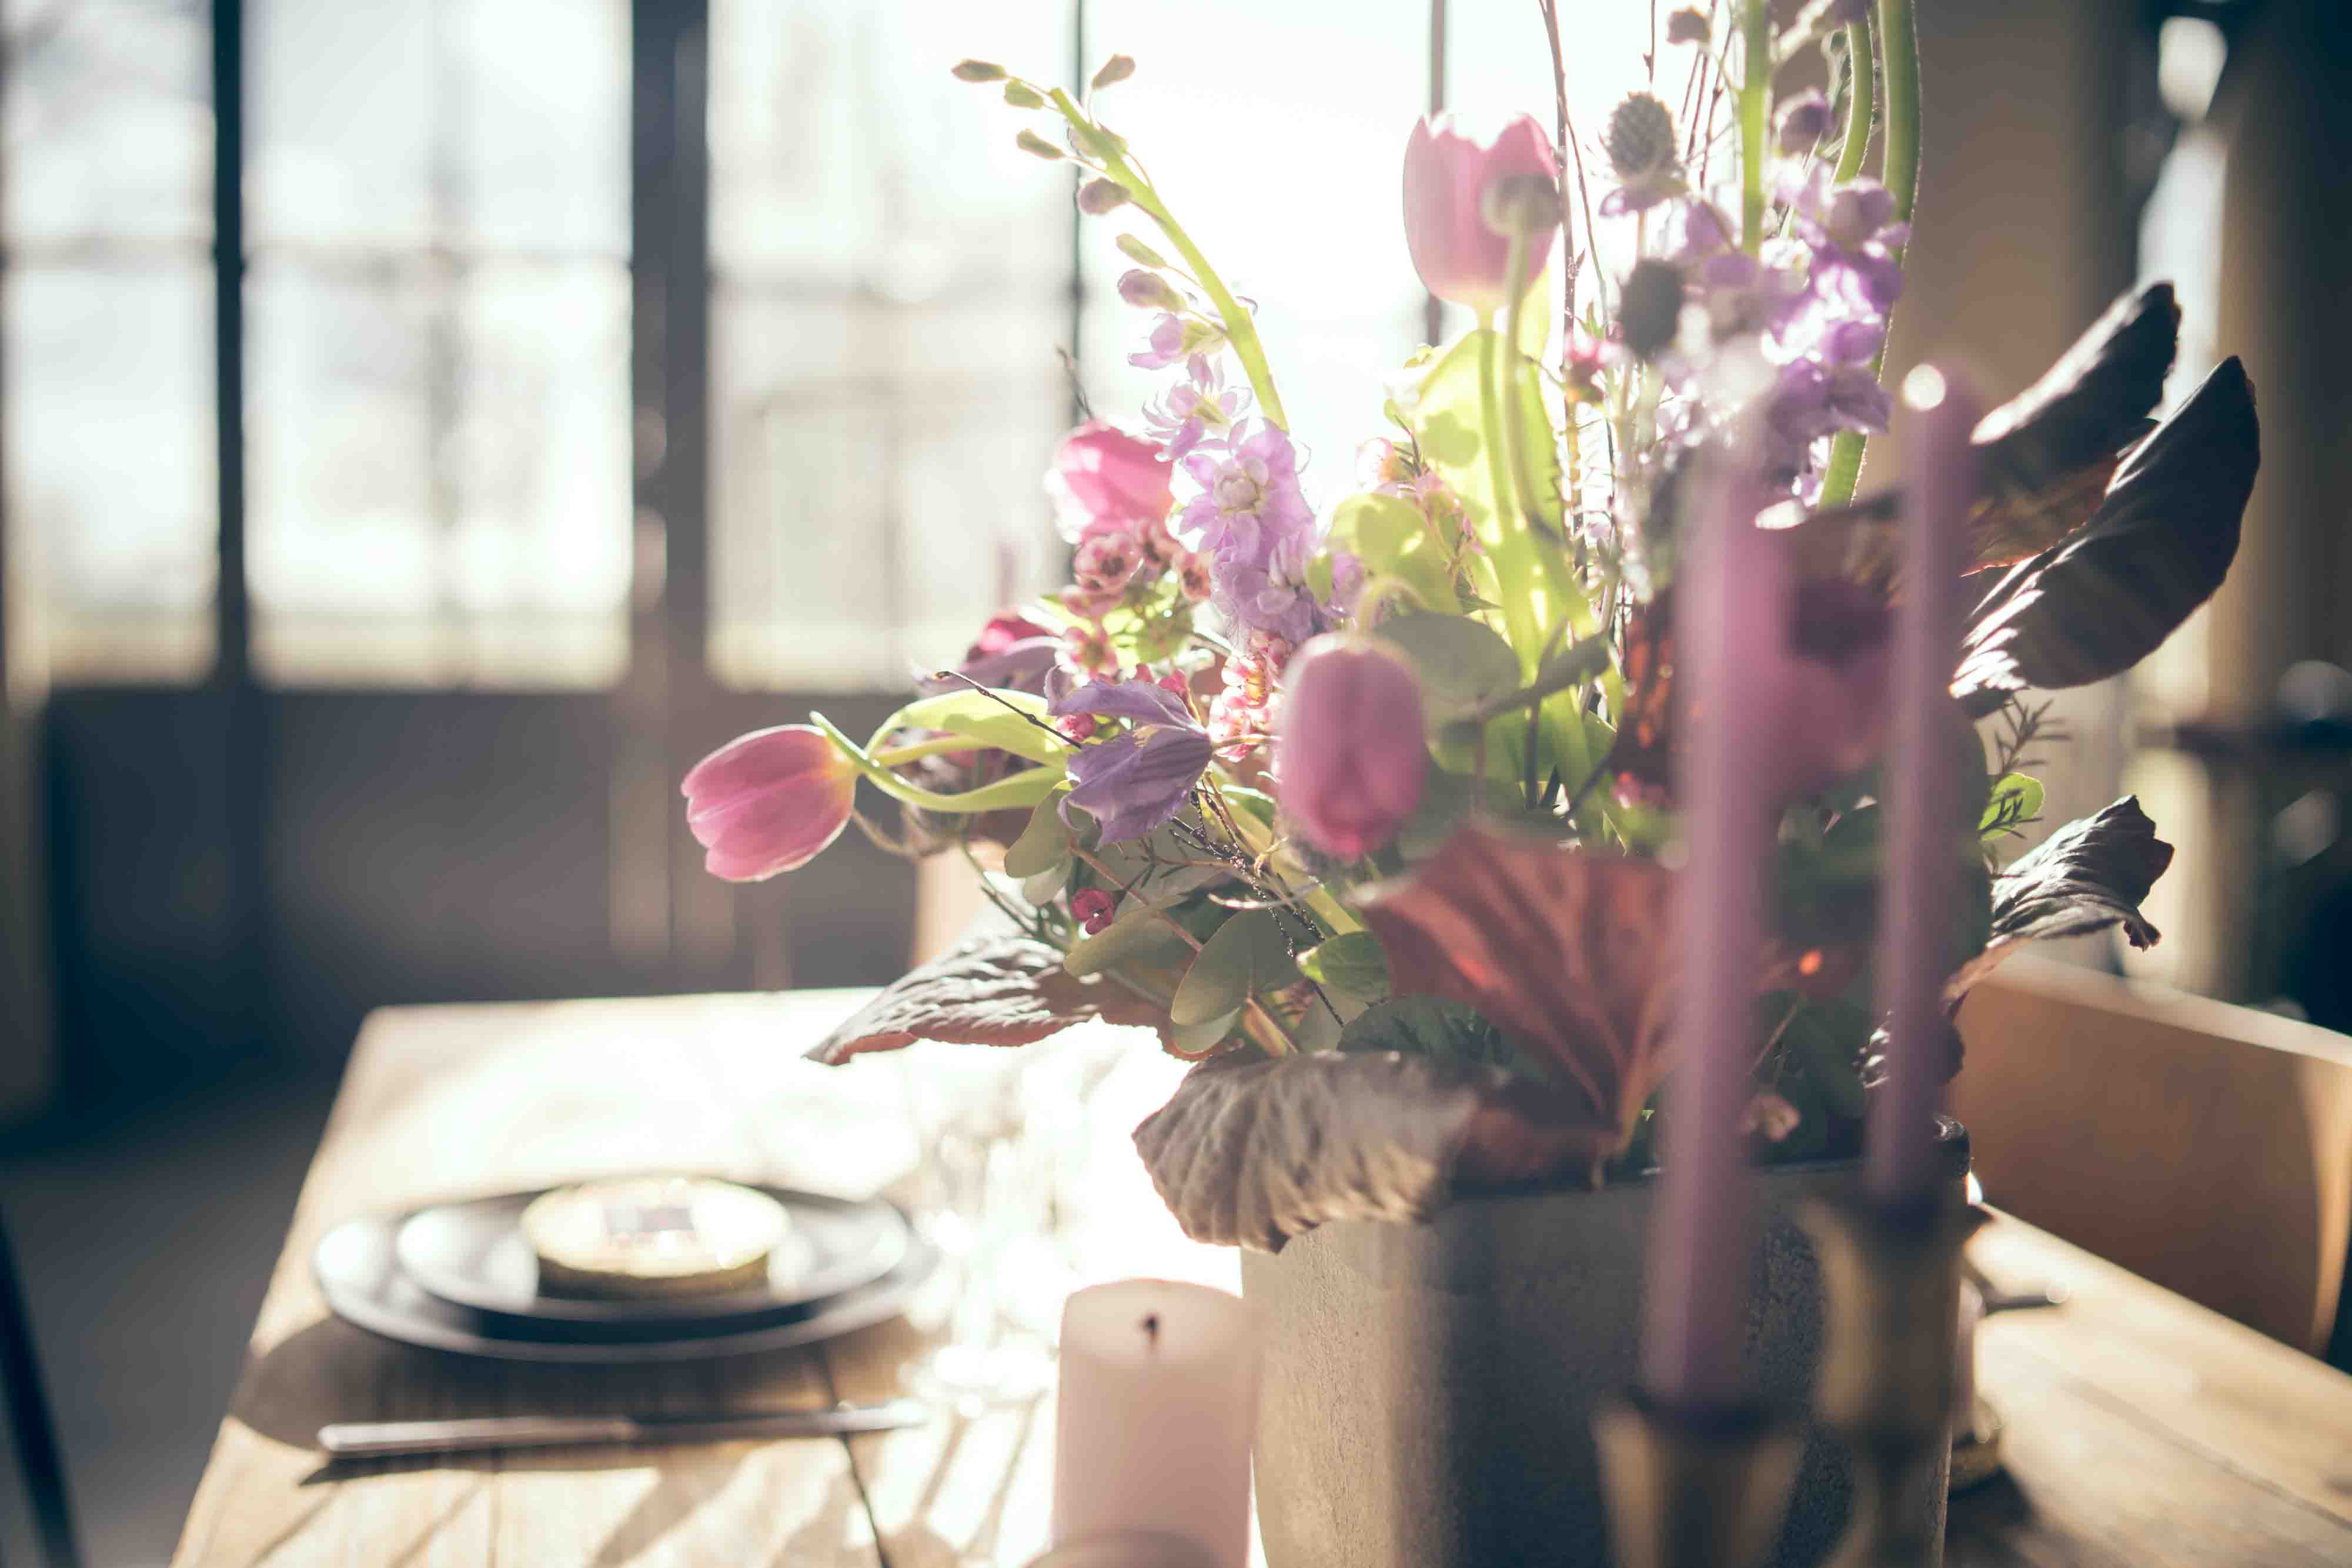 decoration-sous-les-etoiles-amouronair-eduadecore-weddingplanner-weddingdesigner-poitiers (1 (3)